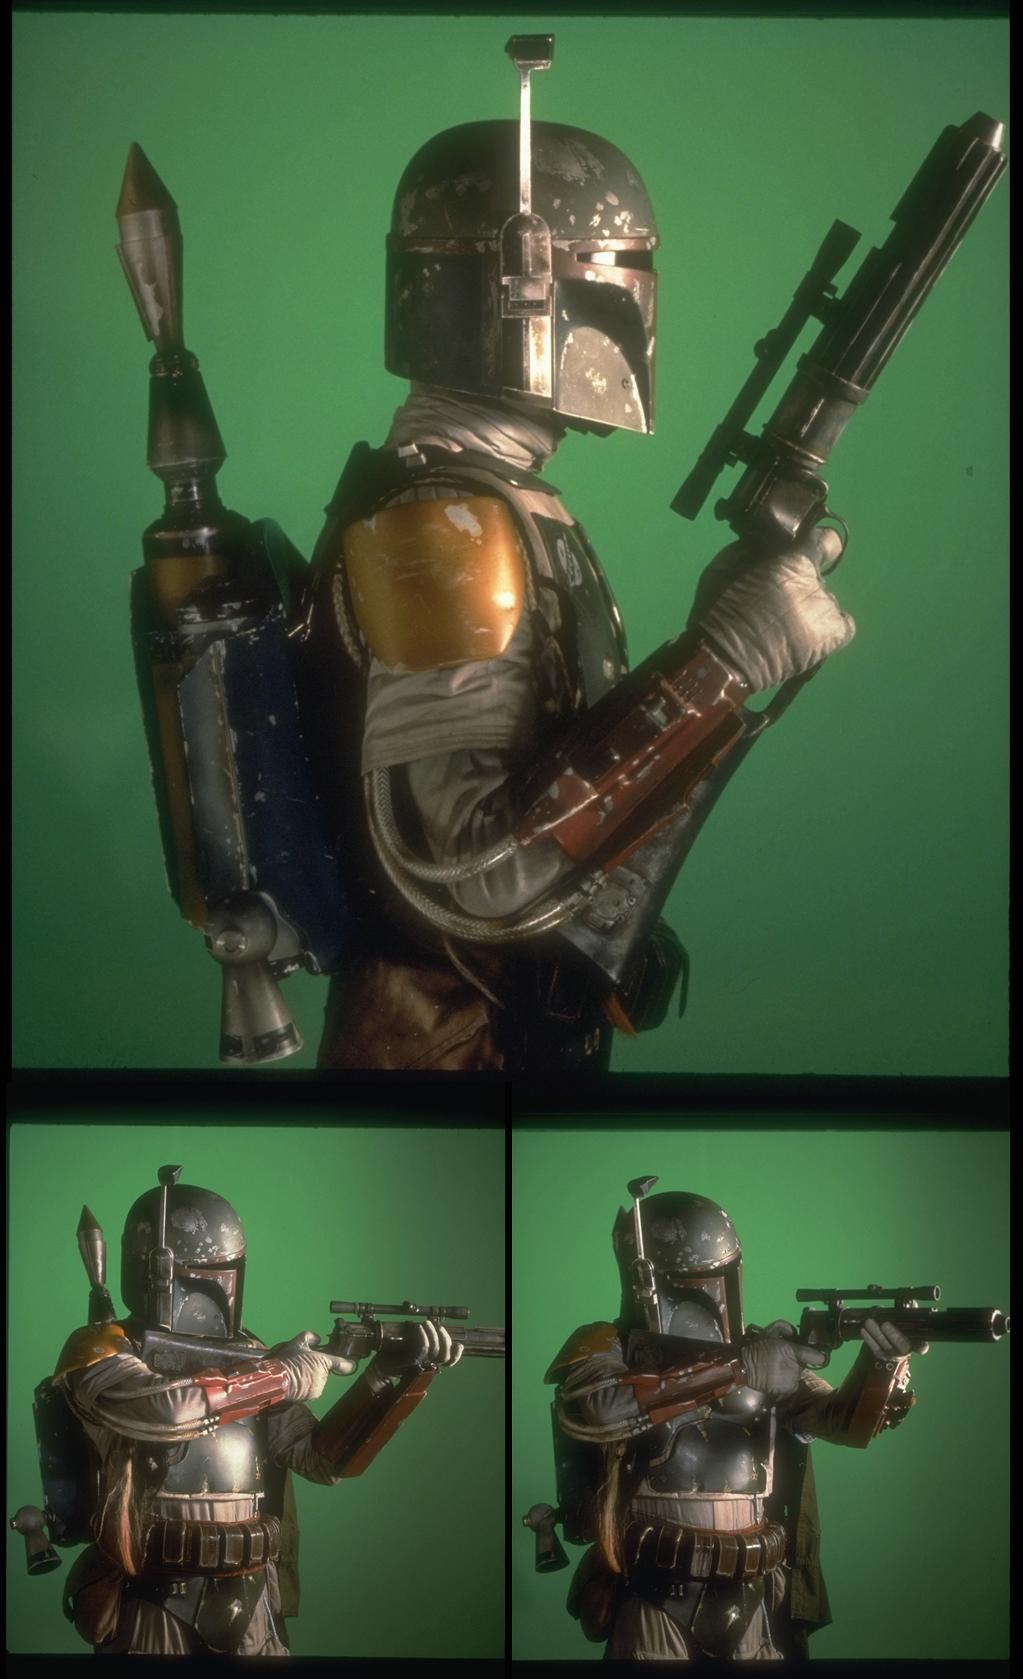 Boba-Fett-Costume-Return-of-the-Jedi-11.png